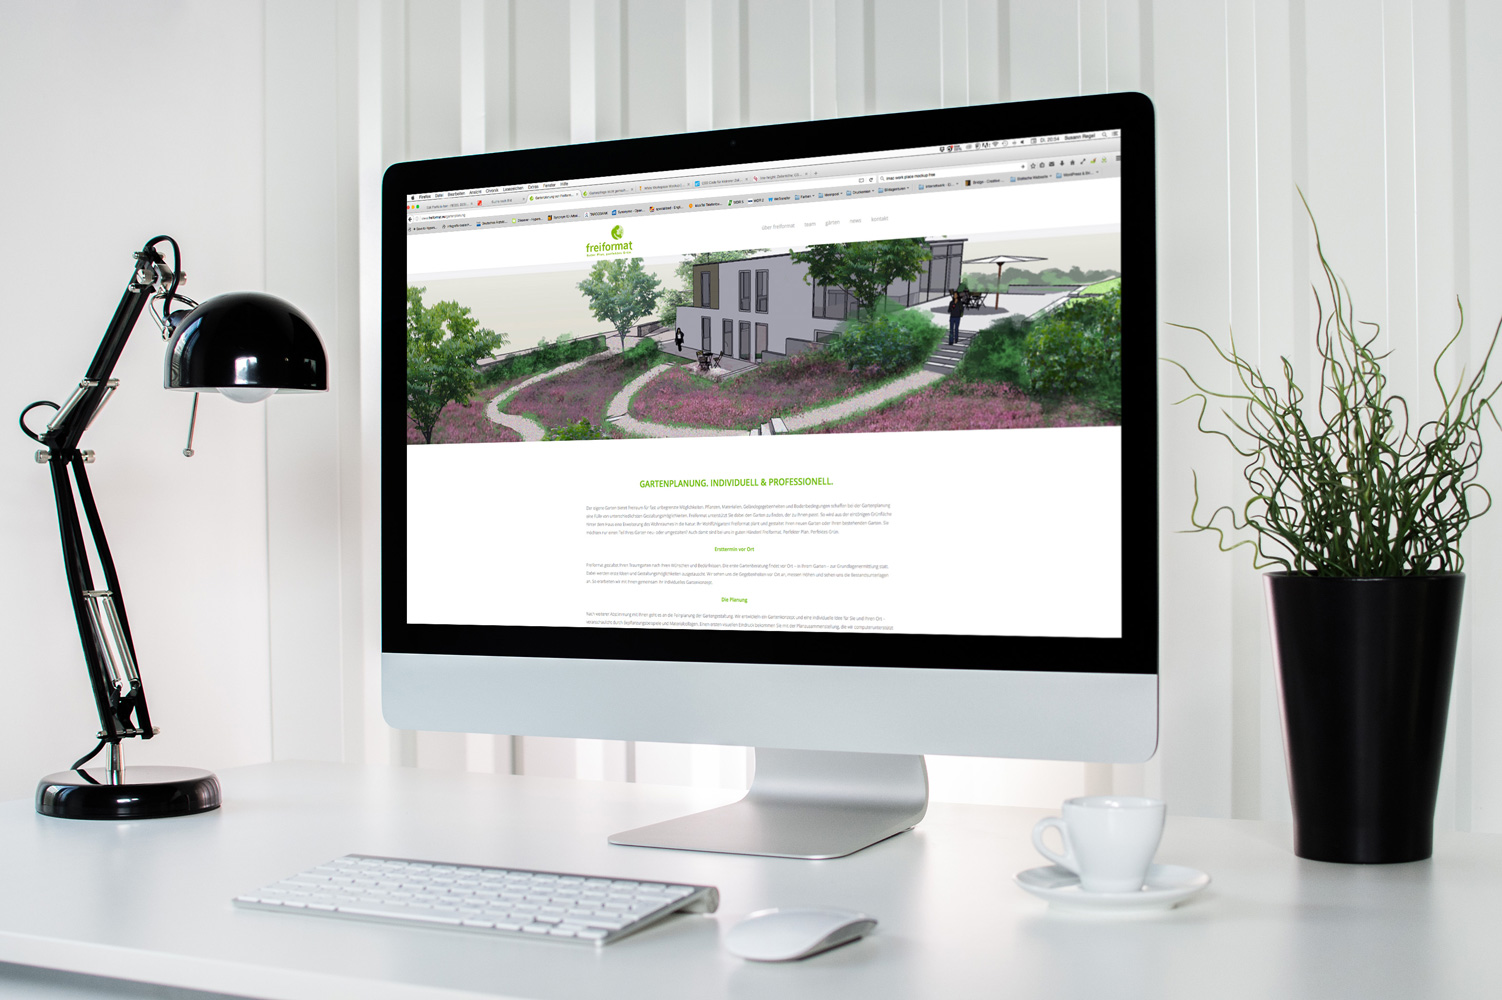 webdesign-regel-design-freiformat-05